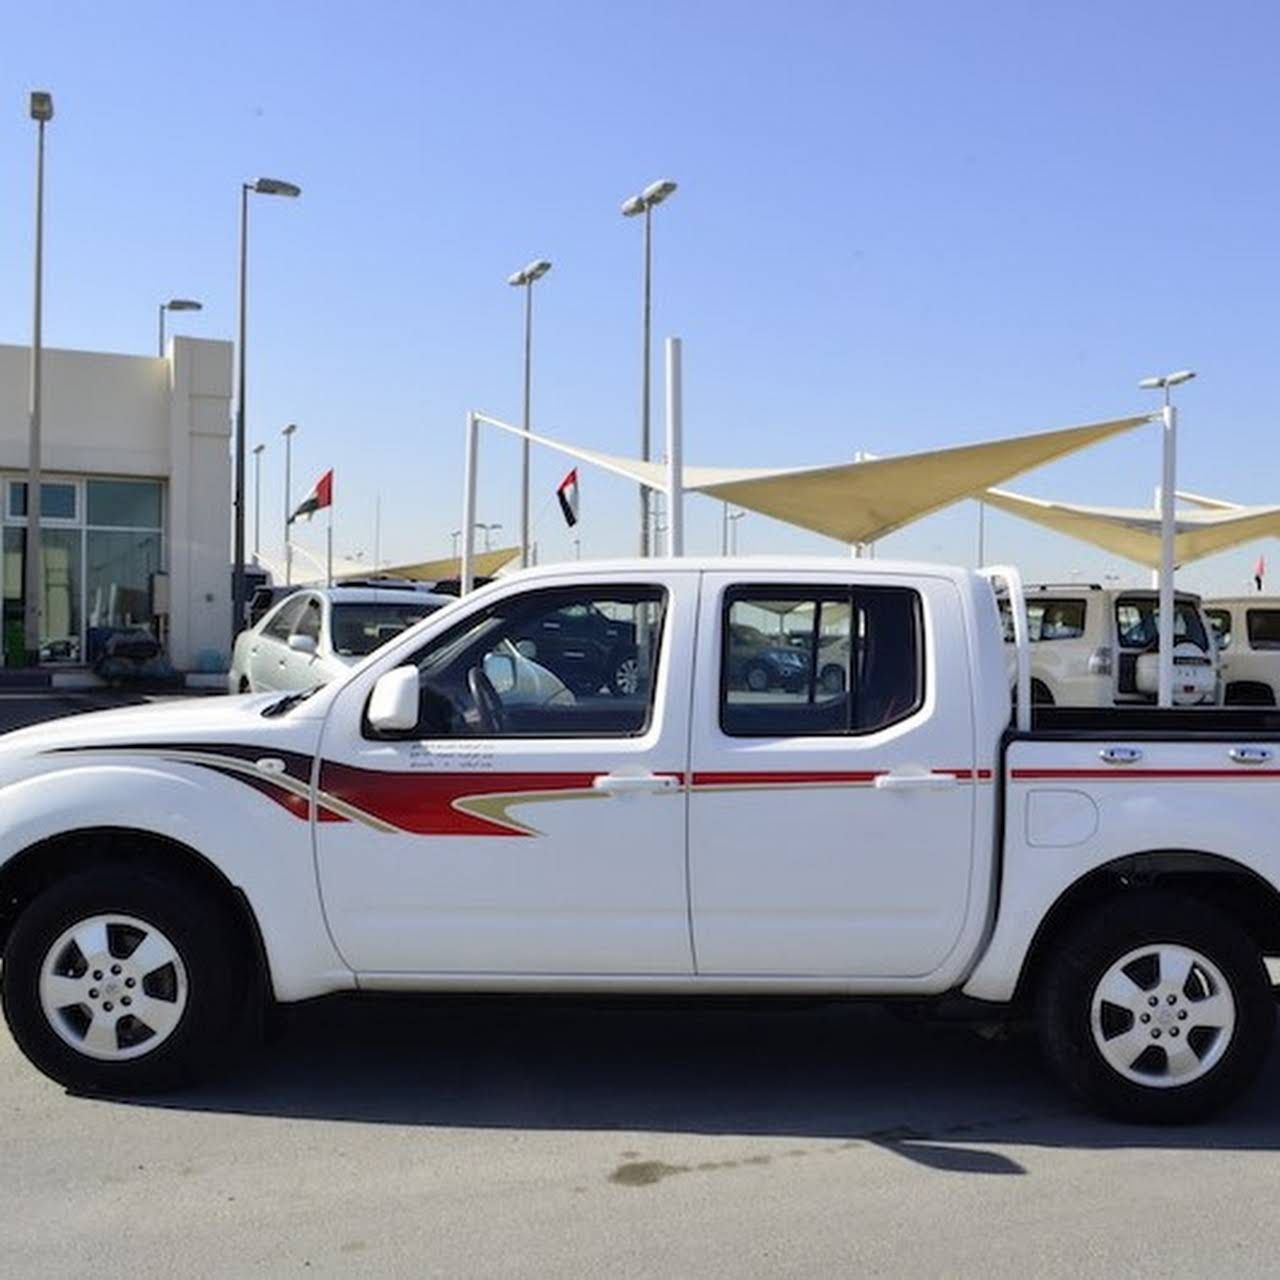 Types Of Pickup Trucks >> Pickup Rent Dubai Provides All Types Of Pickups And Trucks